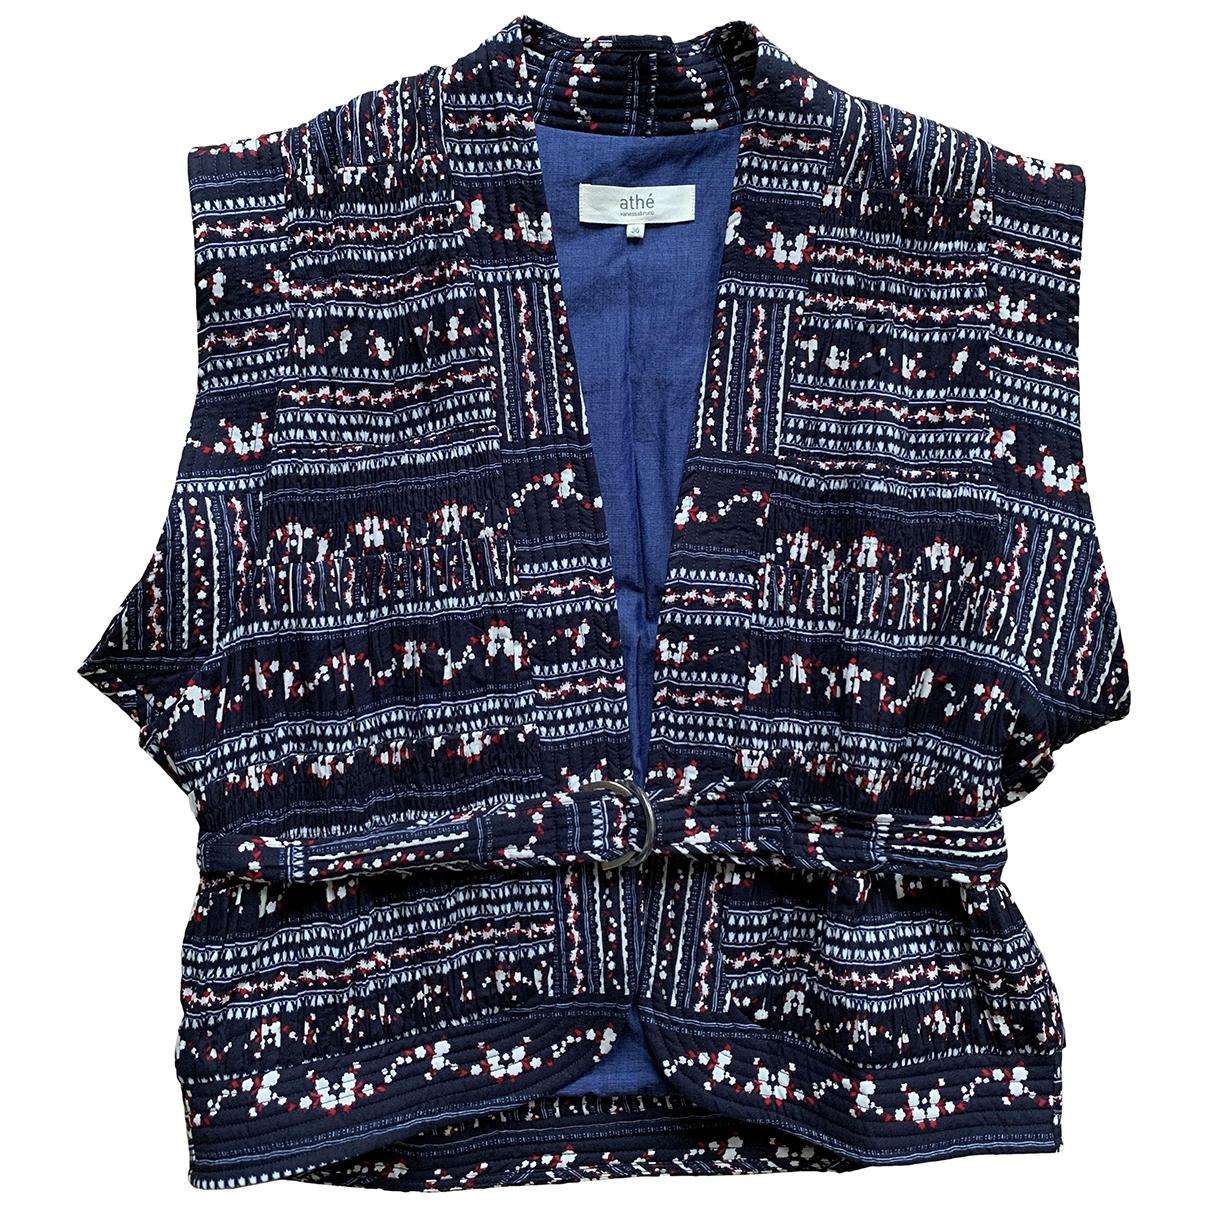 Vanessa Bruno Athe \N Blue Cotton jacket for Women S International